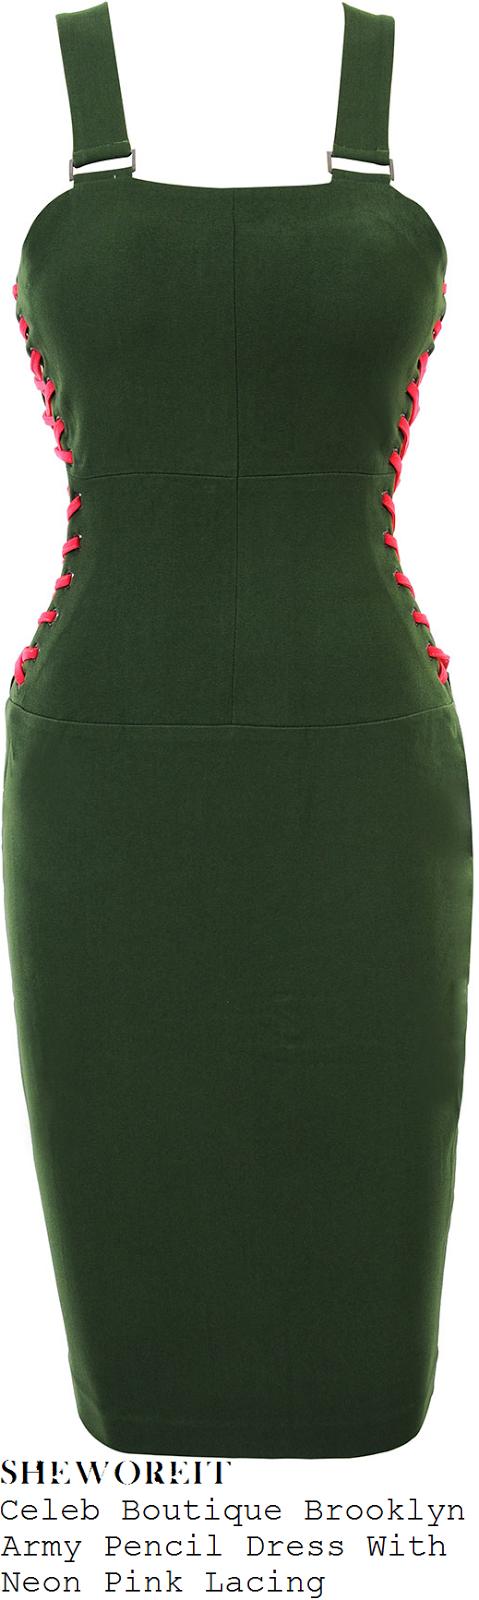 luisa-zissman-khaki-green-pencil-dress-with-hot-pink-lacing-detail